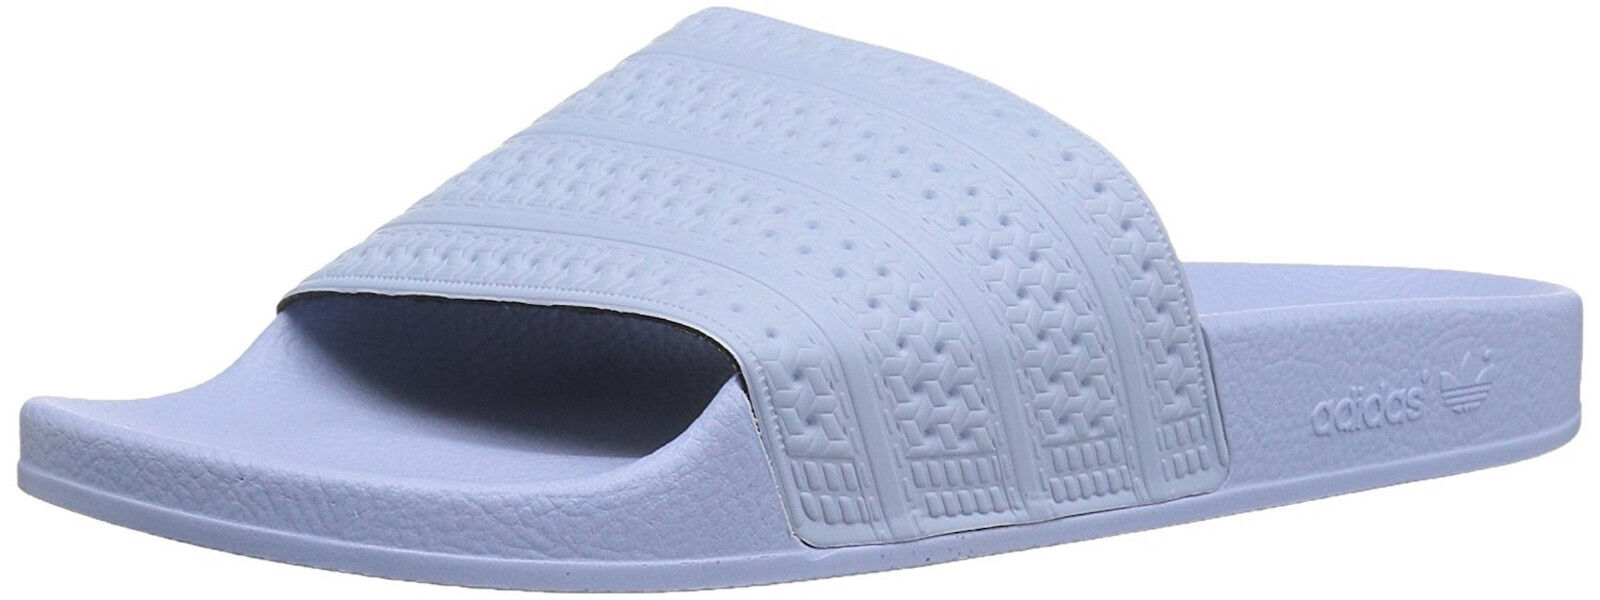 8e5f1e58ef12 Mens adidas Adilette Slides Easy Blue Ba7539 US 11 for sale online ...